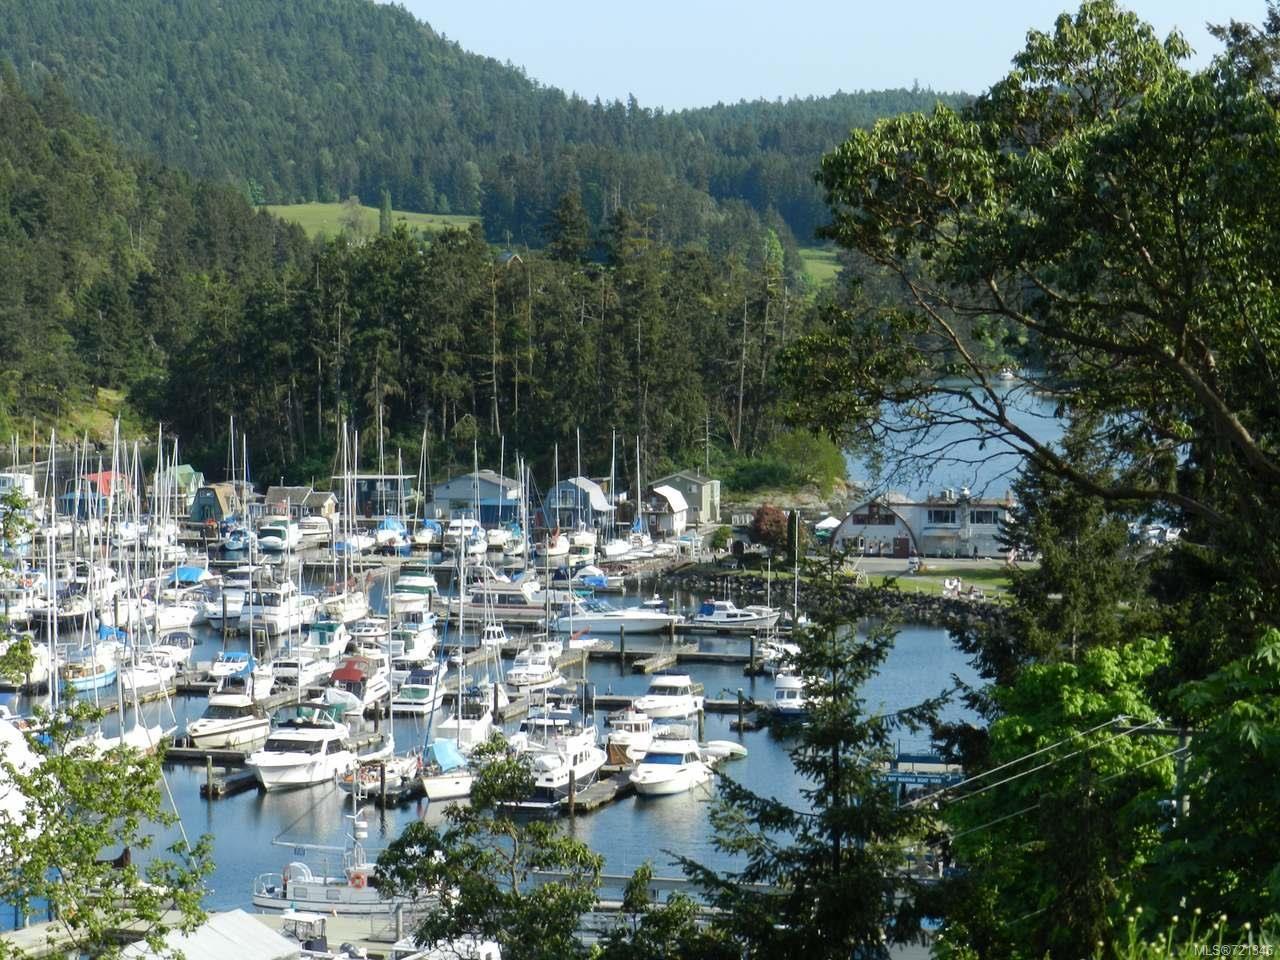 Main Photo: SL 10 1060 SHORE PINE Close in DUNCAN: Du East Duncan Land for sale (Zone 3 - Cowichan Valley)  : MLS®# 721346